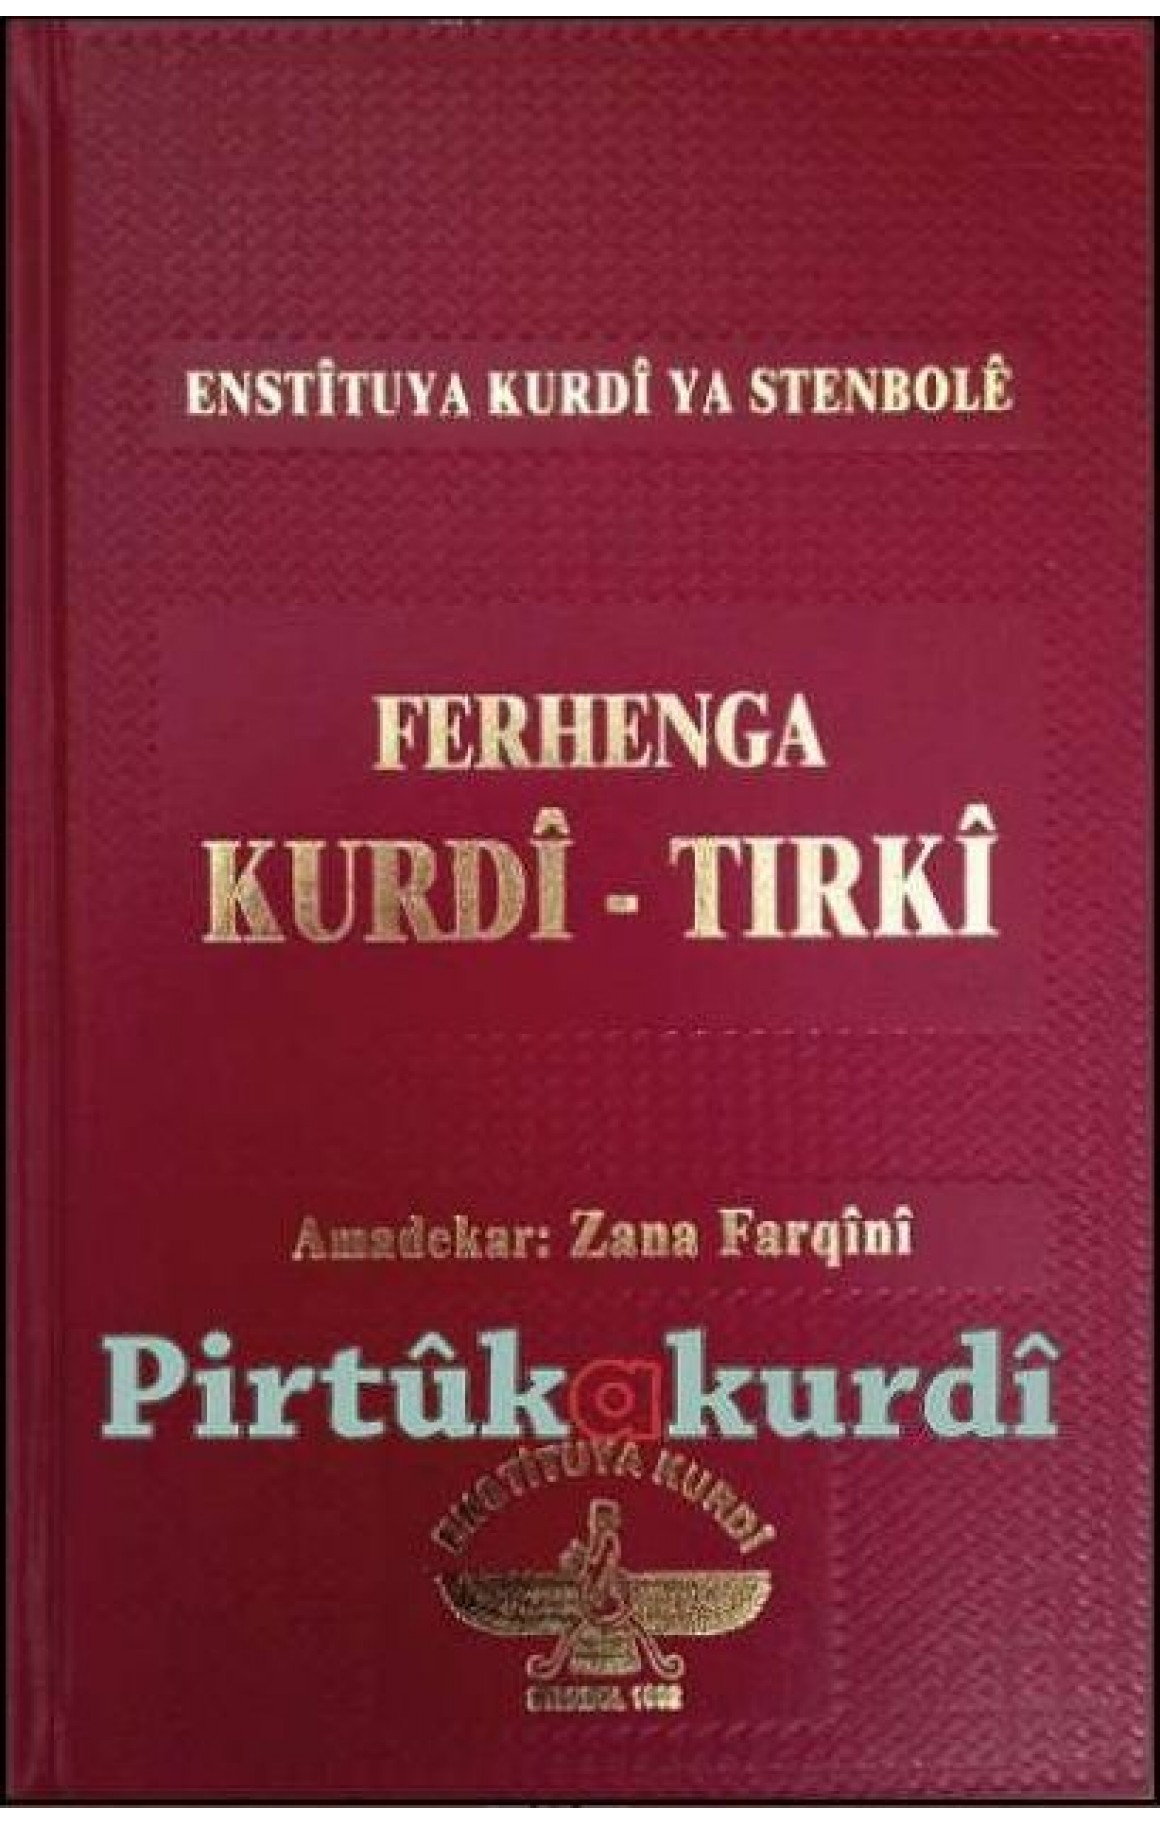 Ferhenga Kurdi Tirki - Zana Farqini